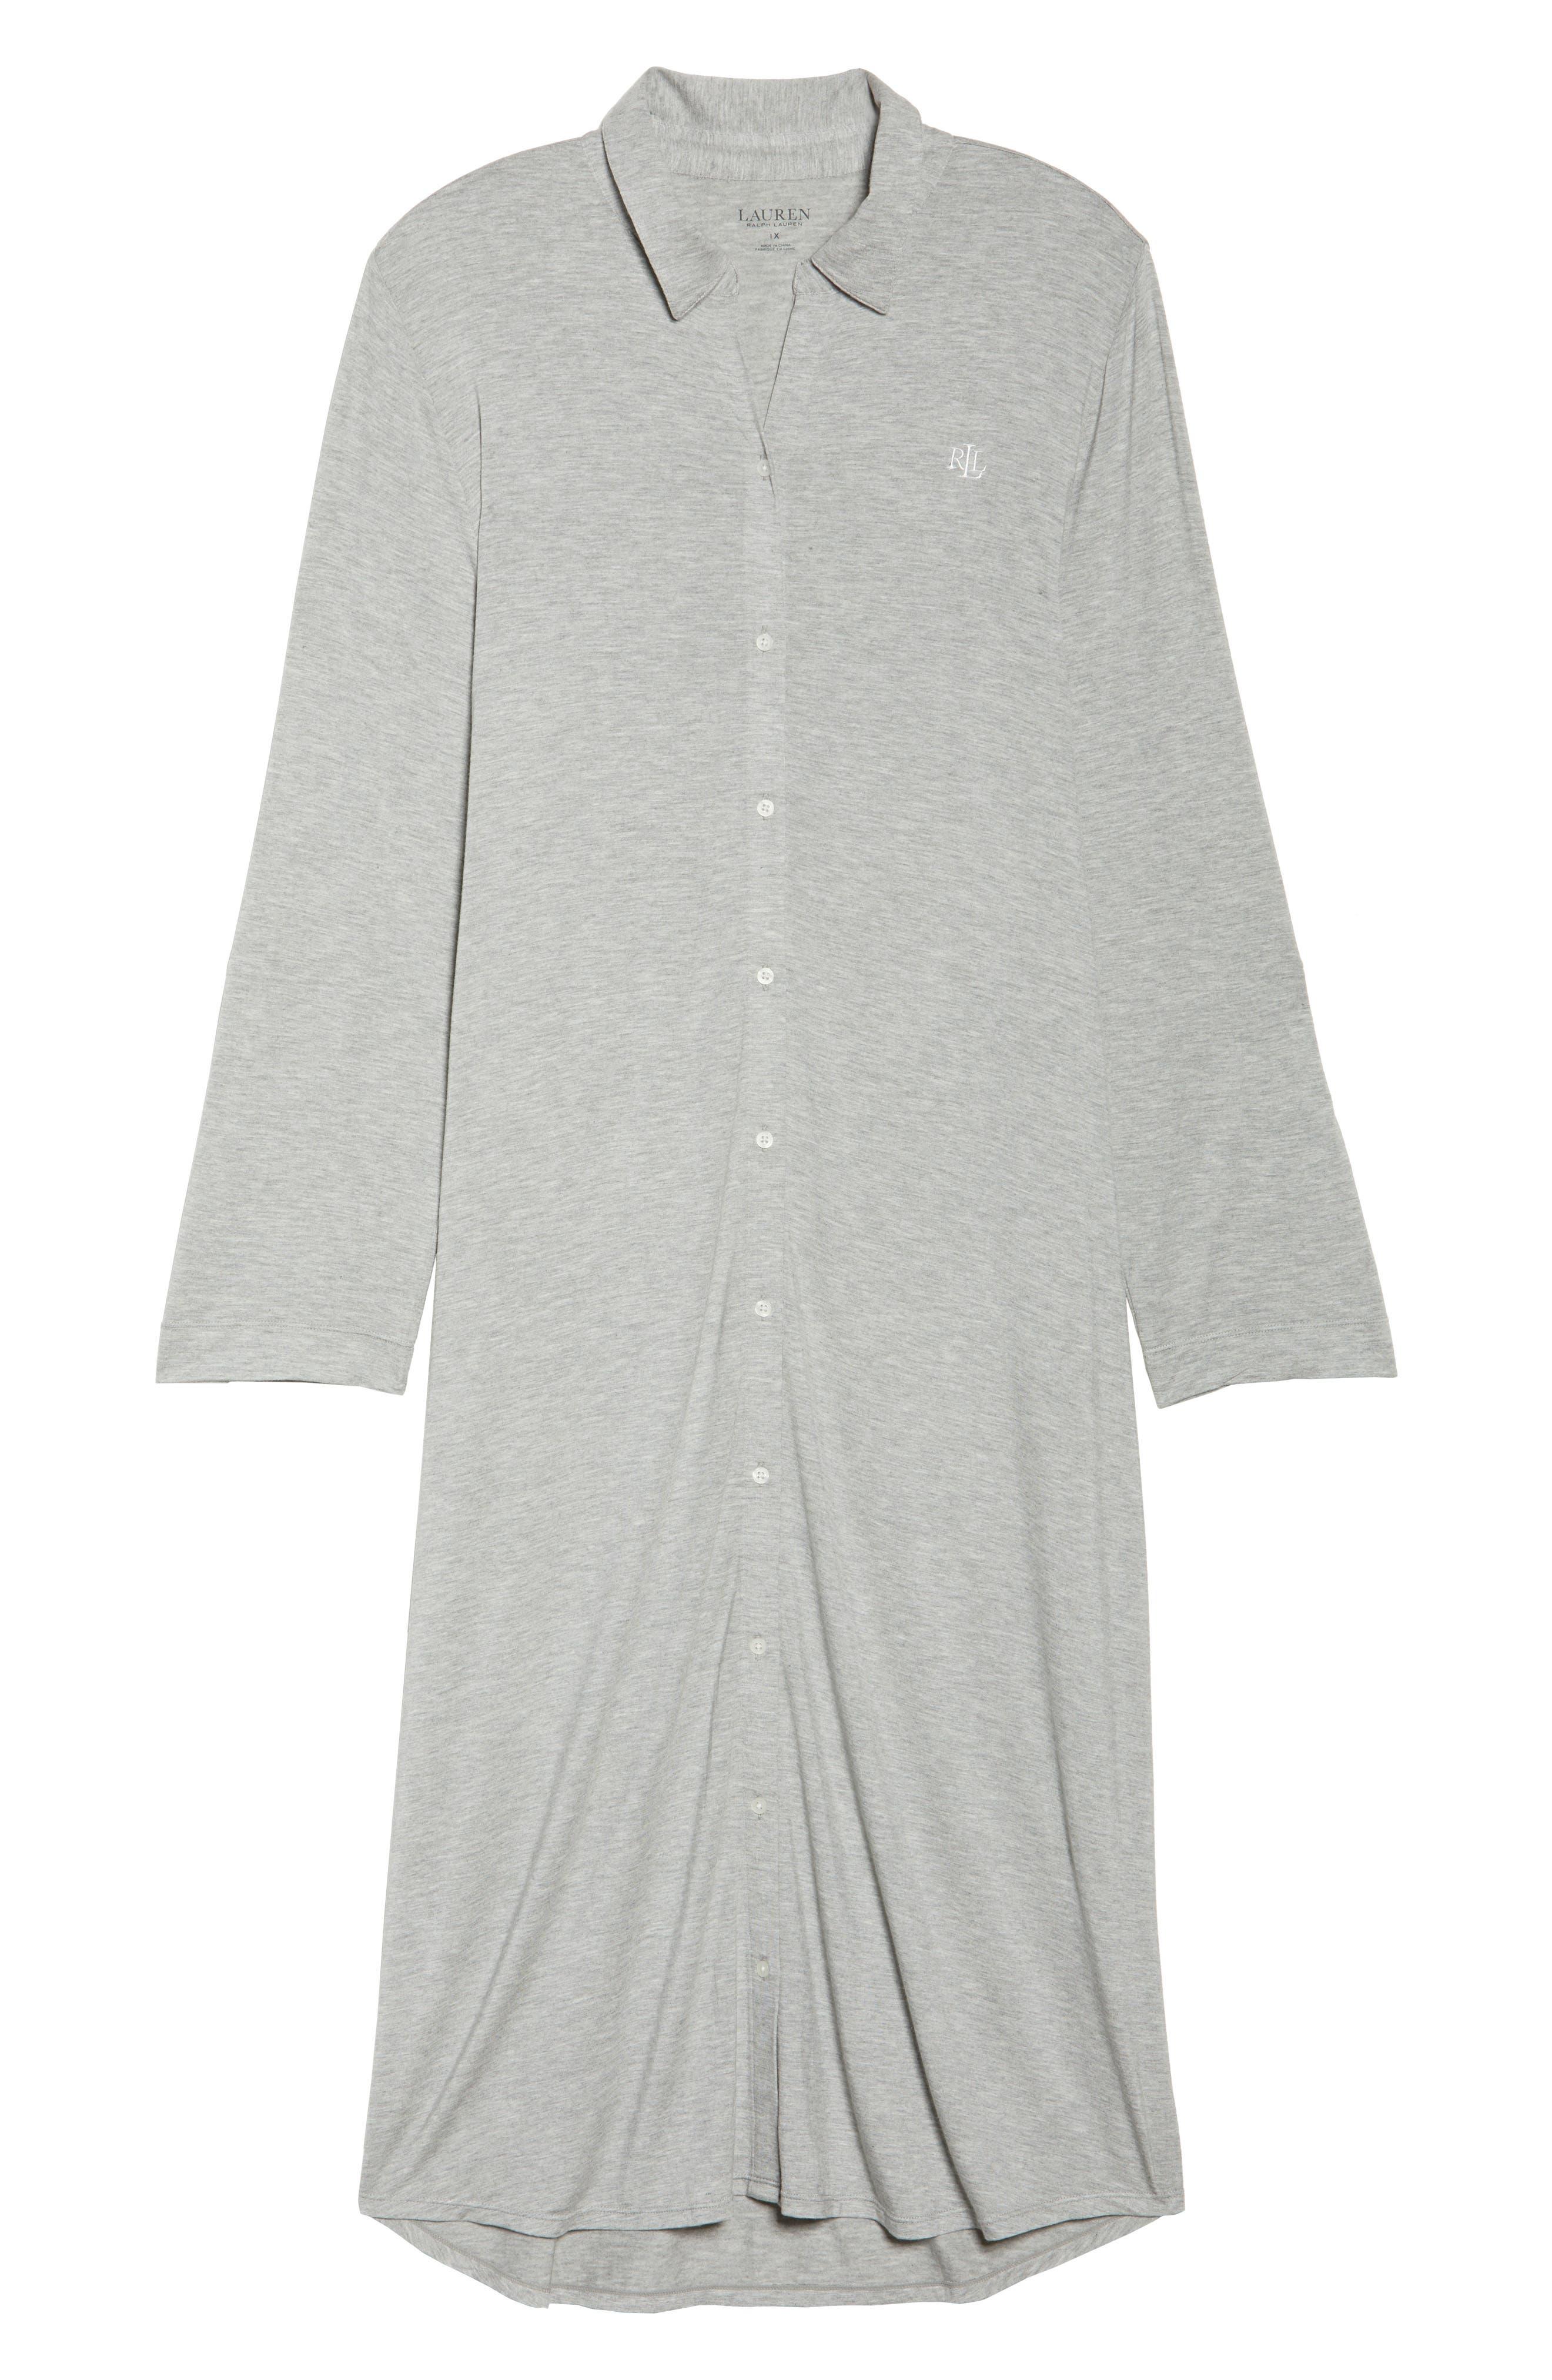 Long Night Shirt,                             Alternate thumbnail 4, color,                             Heather Grey Feeder Stripe